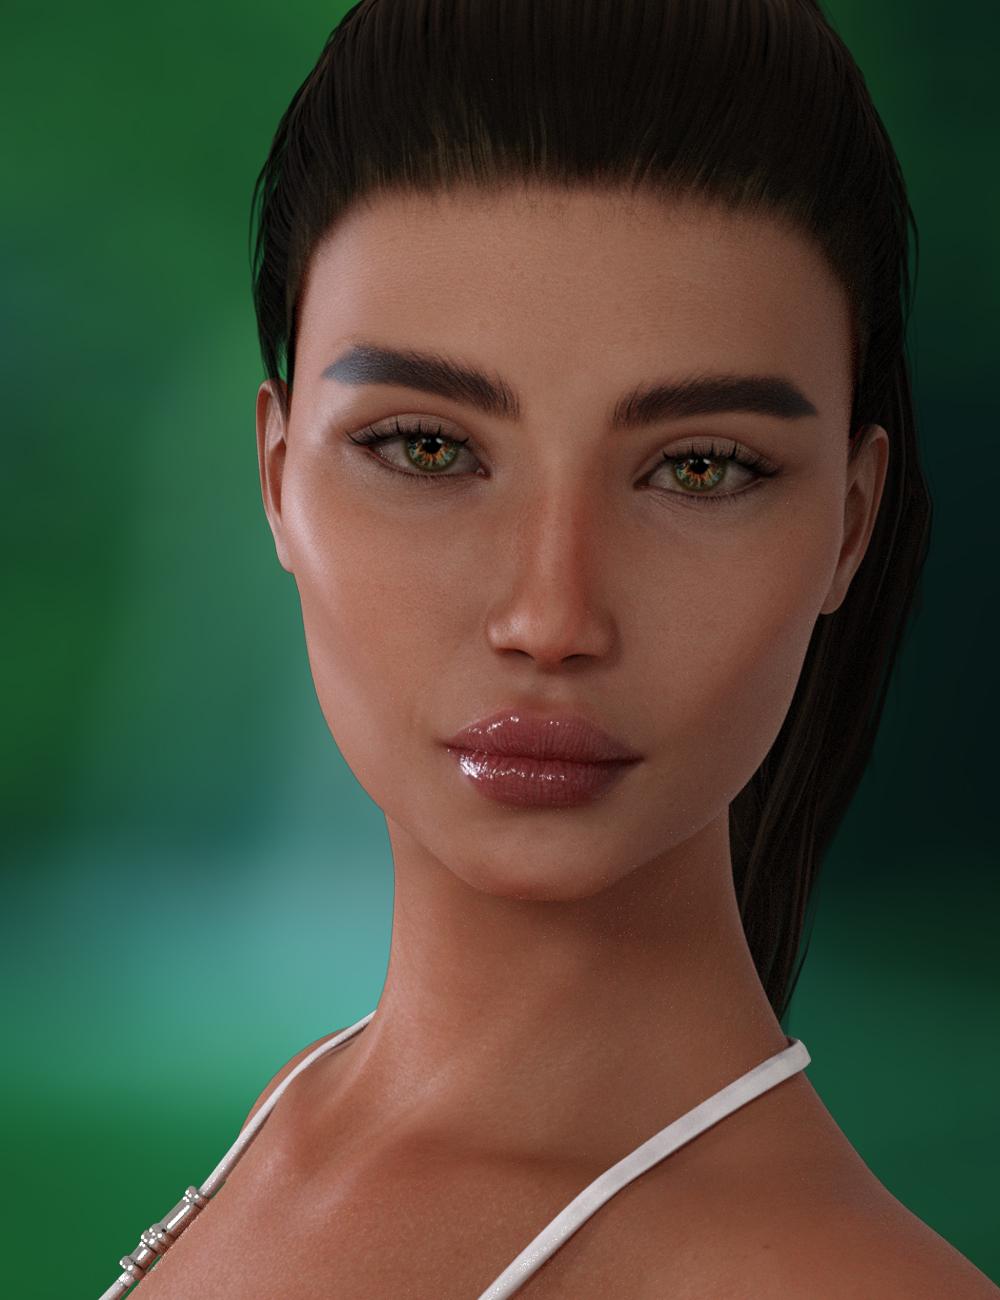 Chandler For Genesis 8 Female by: hotlilme74, 3D Models by Daz 3D